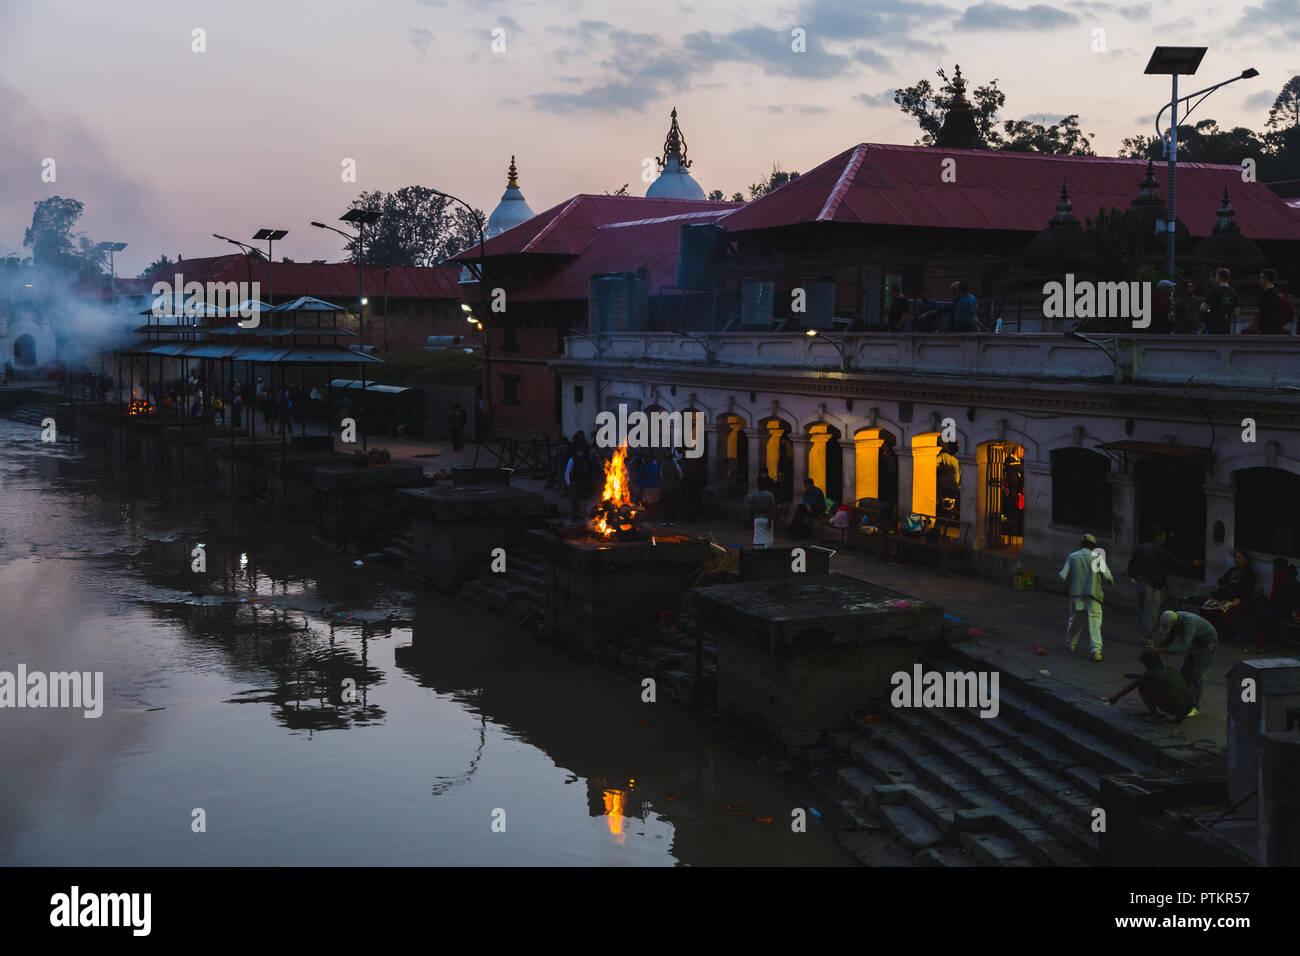 Kathmandu,Nepal - Oct 8,2018:Hindu cremation rituals at the banks of Bagmati river at Pashupatinath Temple premises Aryaghat , Kathmandu. - Stock Image